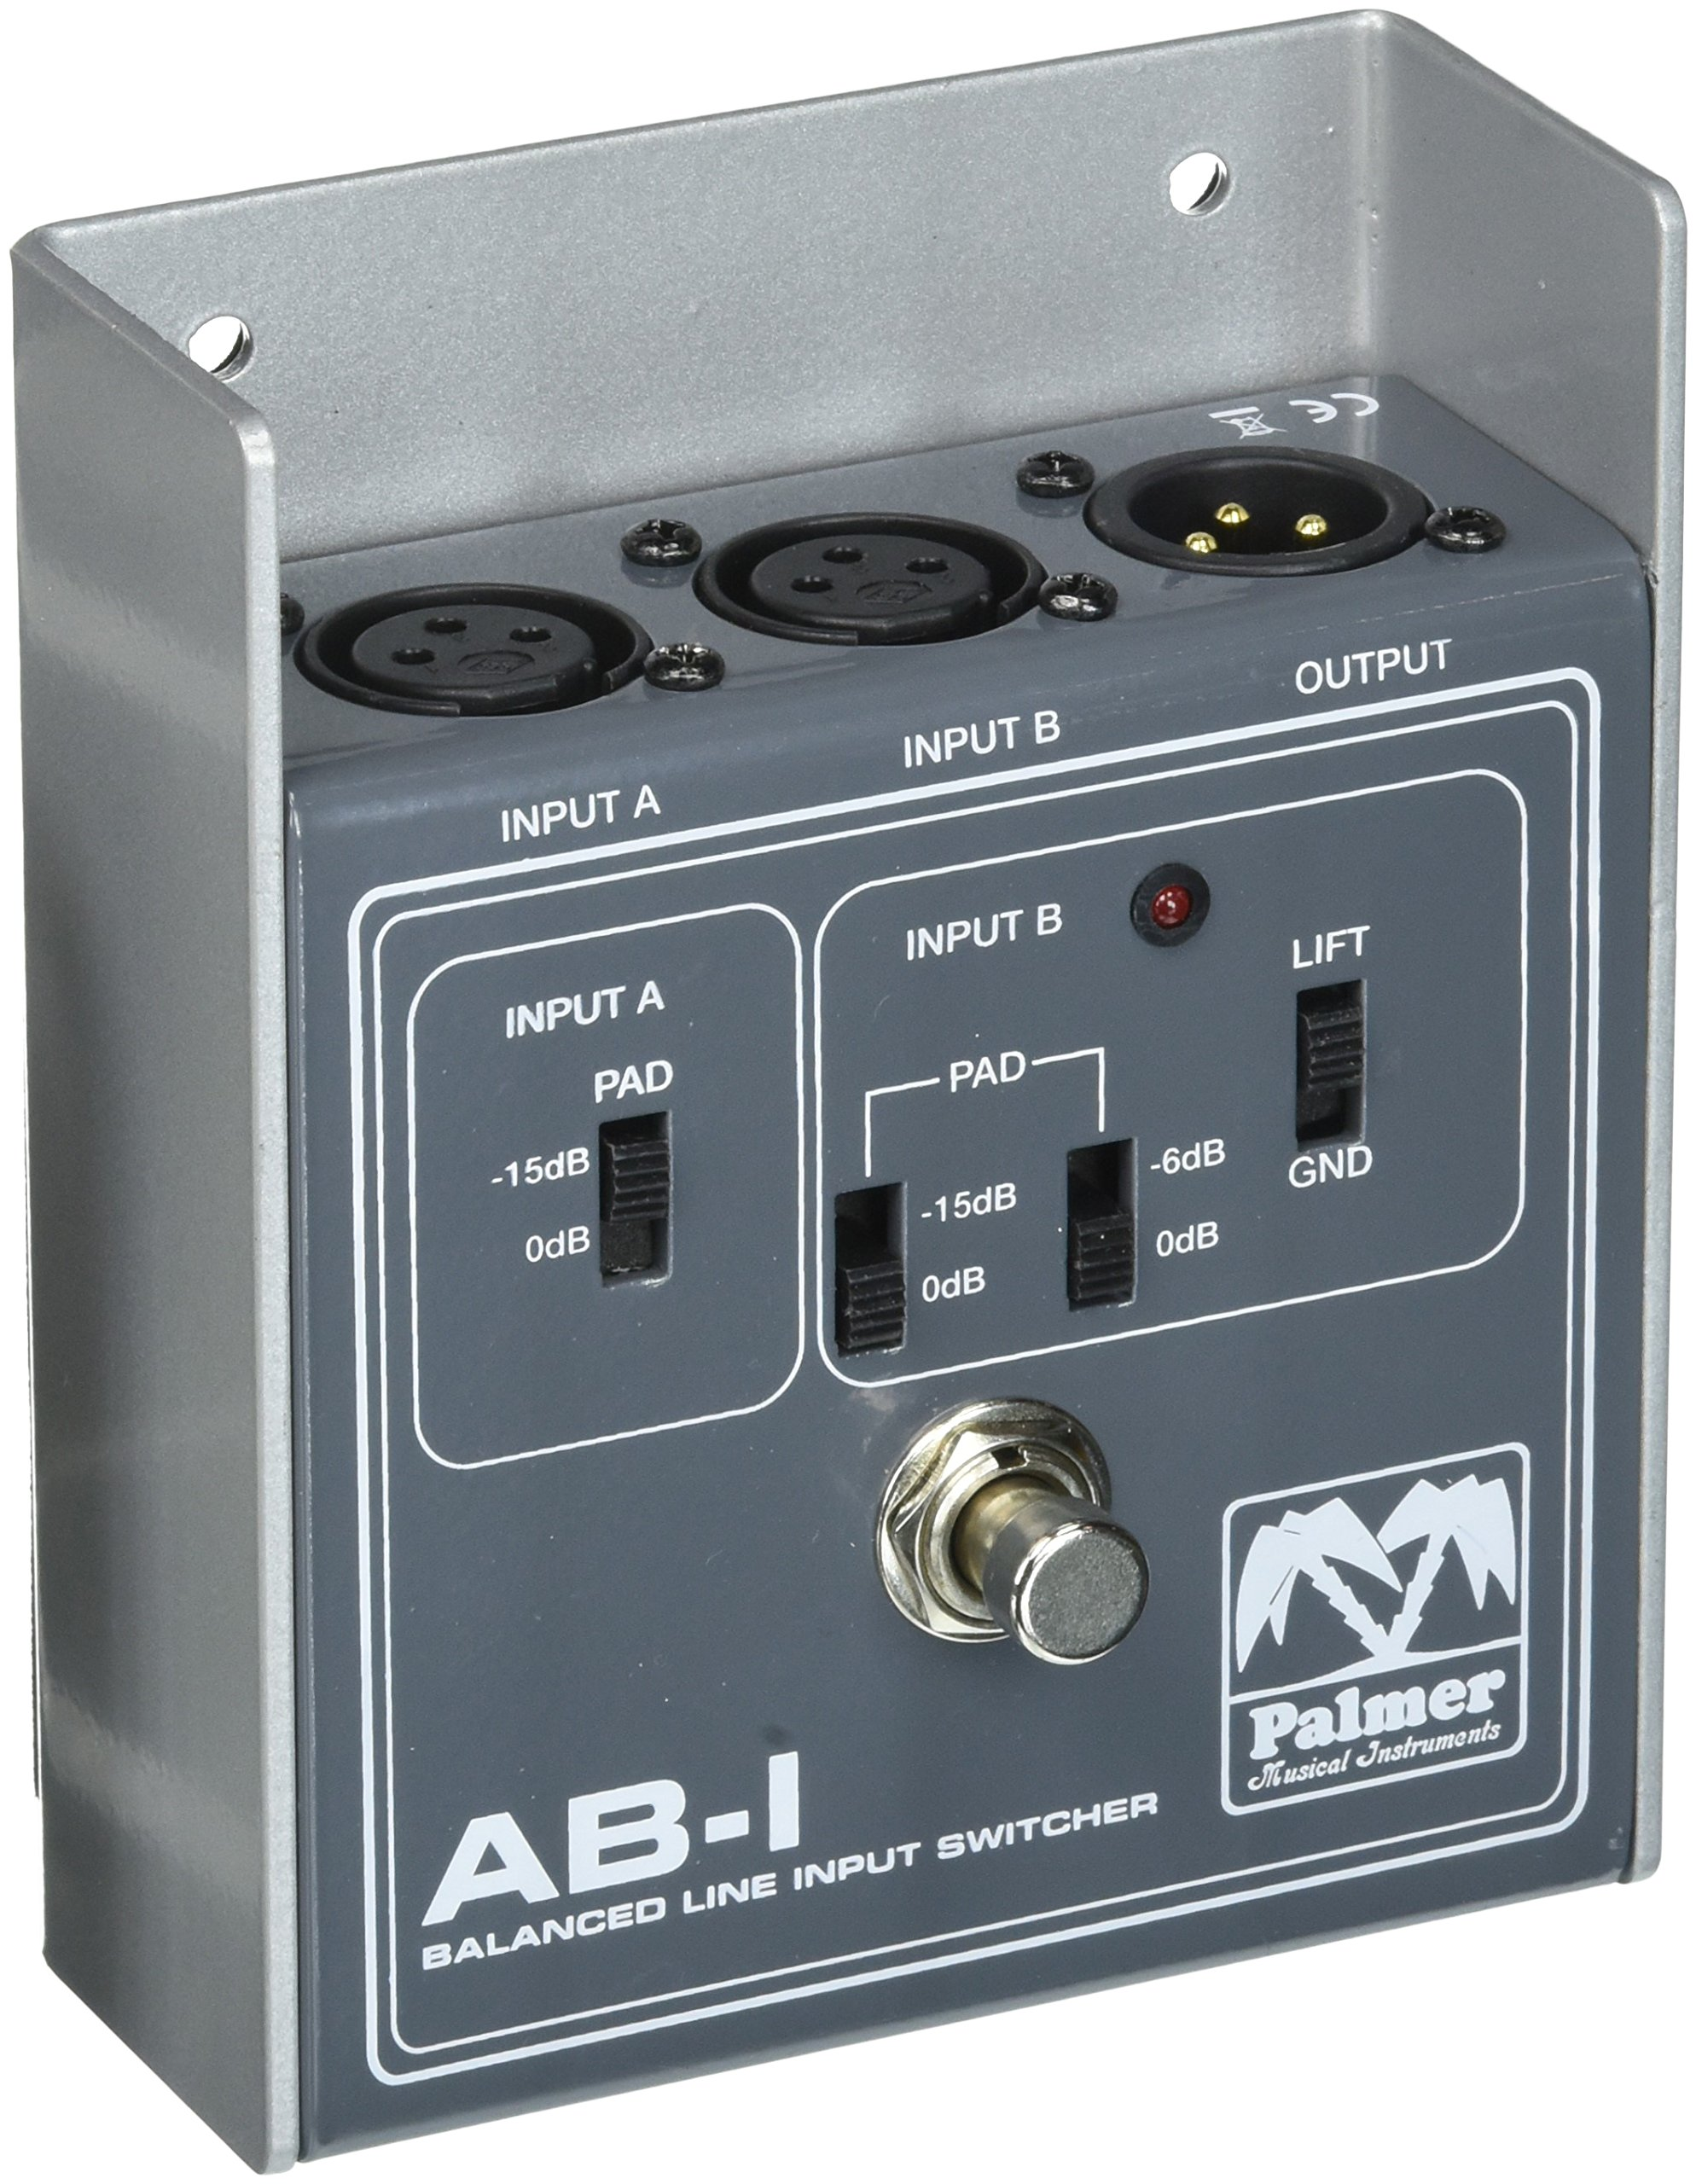 Palmer PAL-PEABI Balanced line input switcher by Palmer